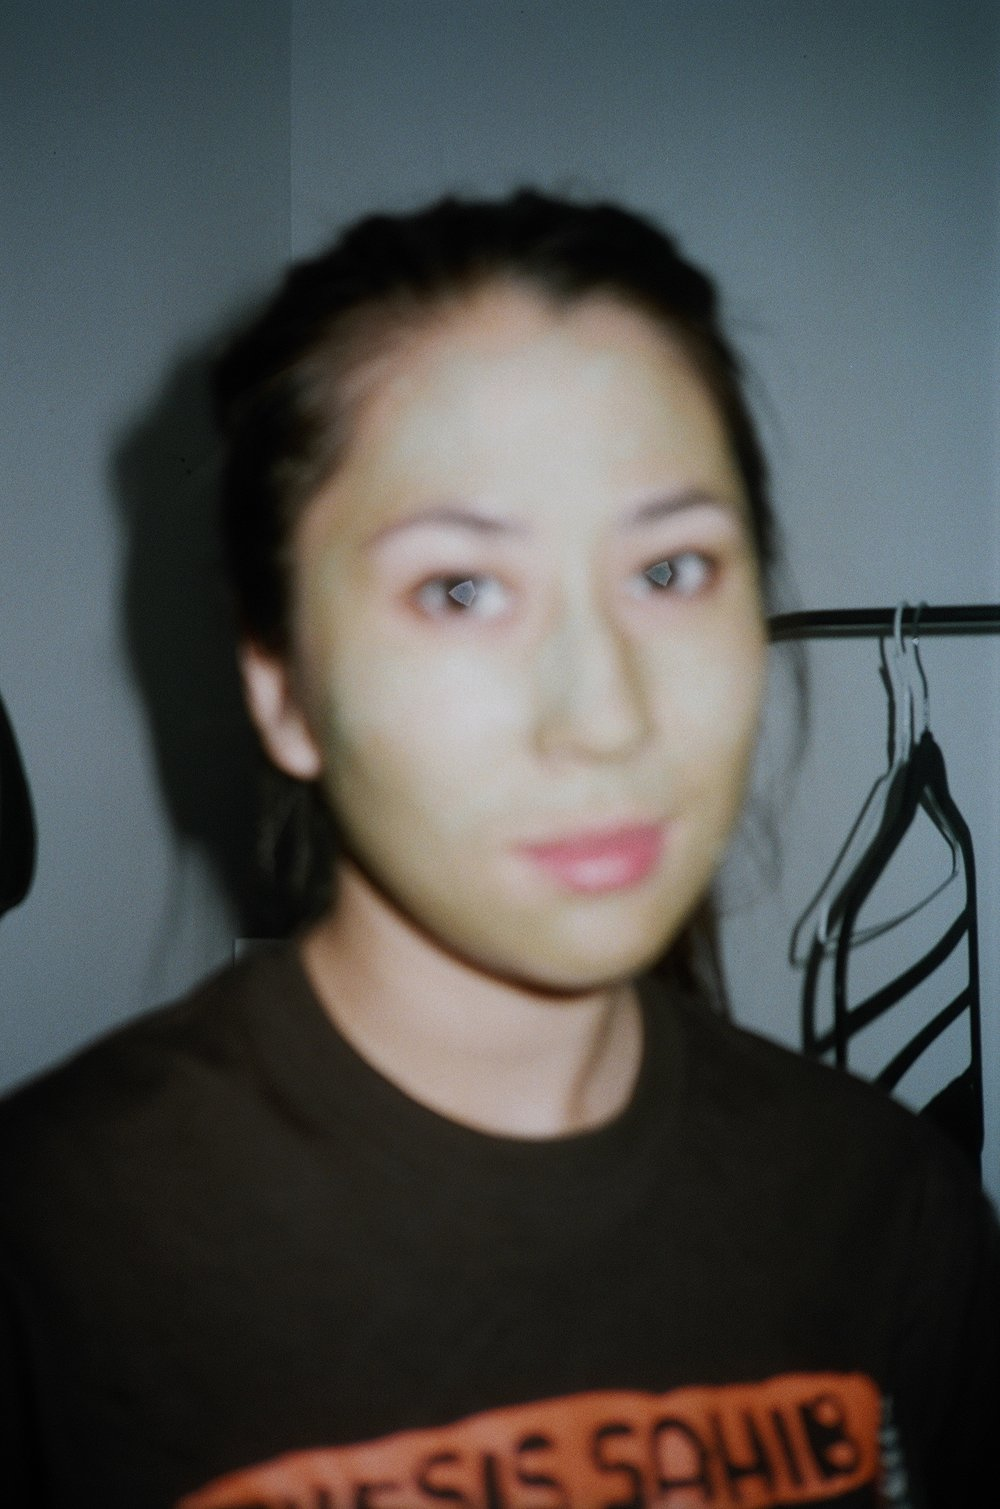 Adrianna, 2014